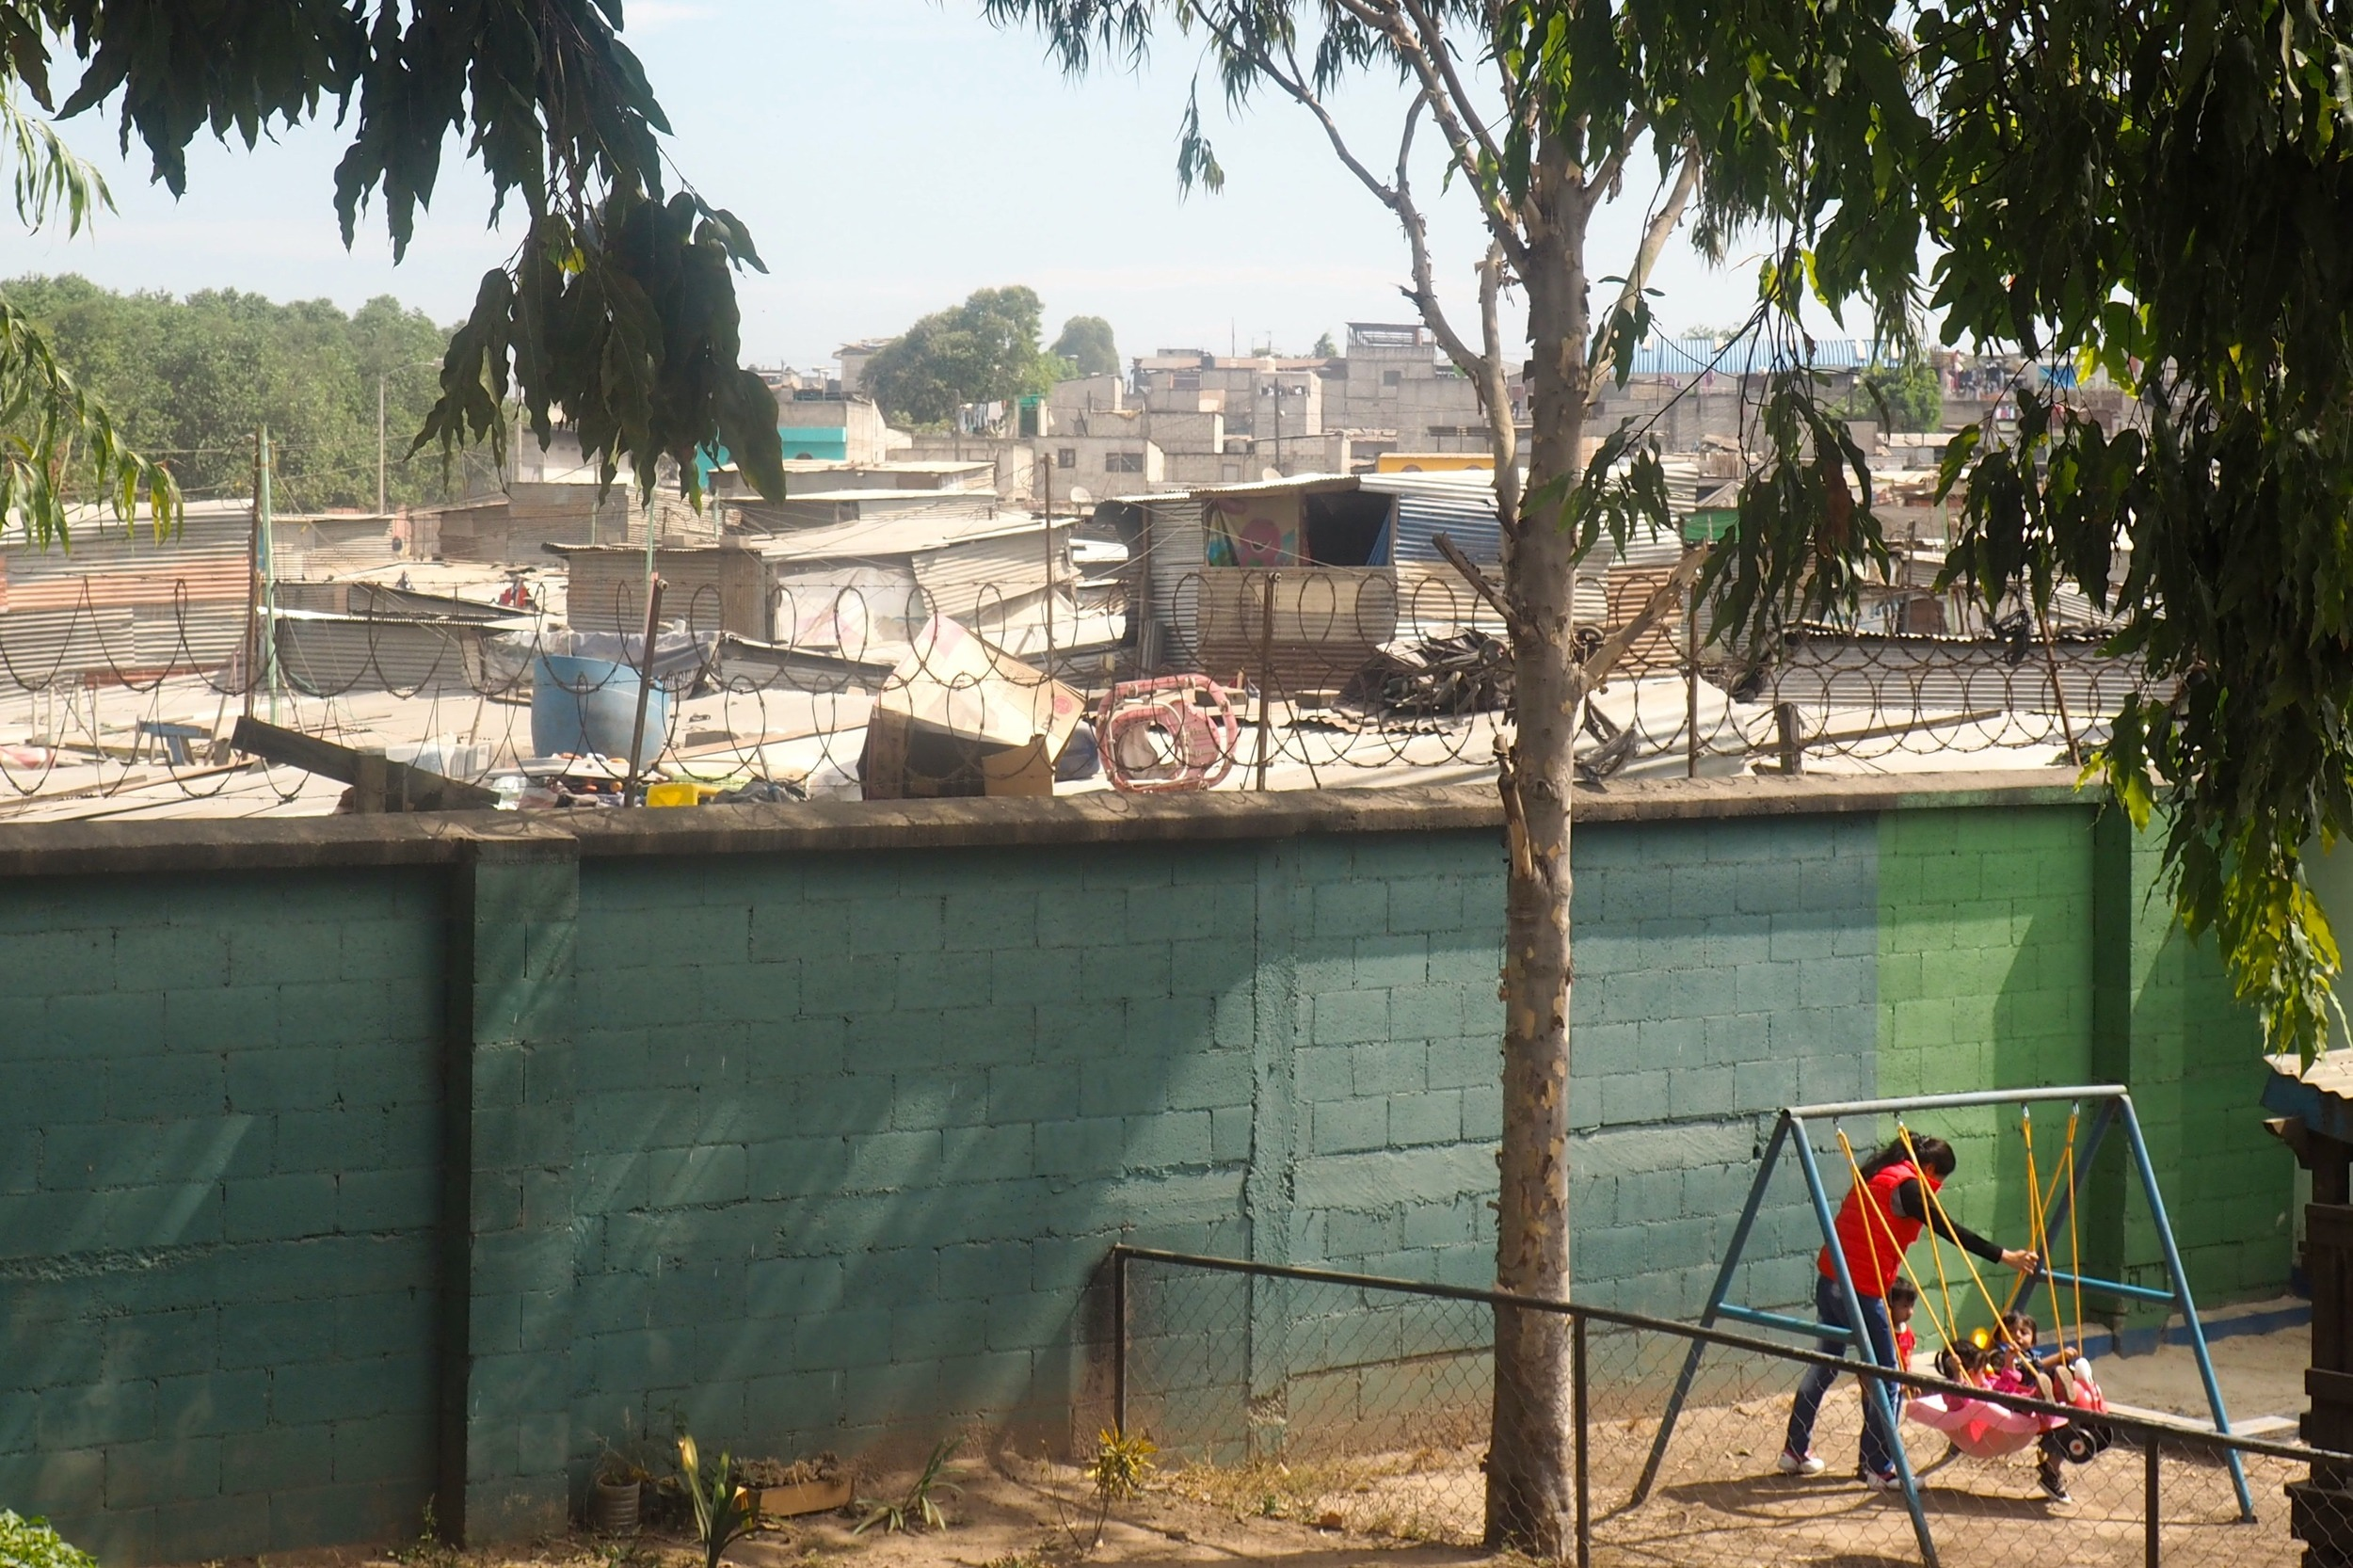 guatemala city slums